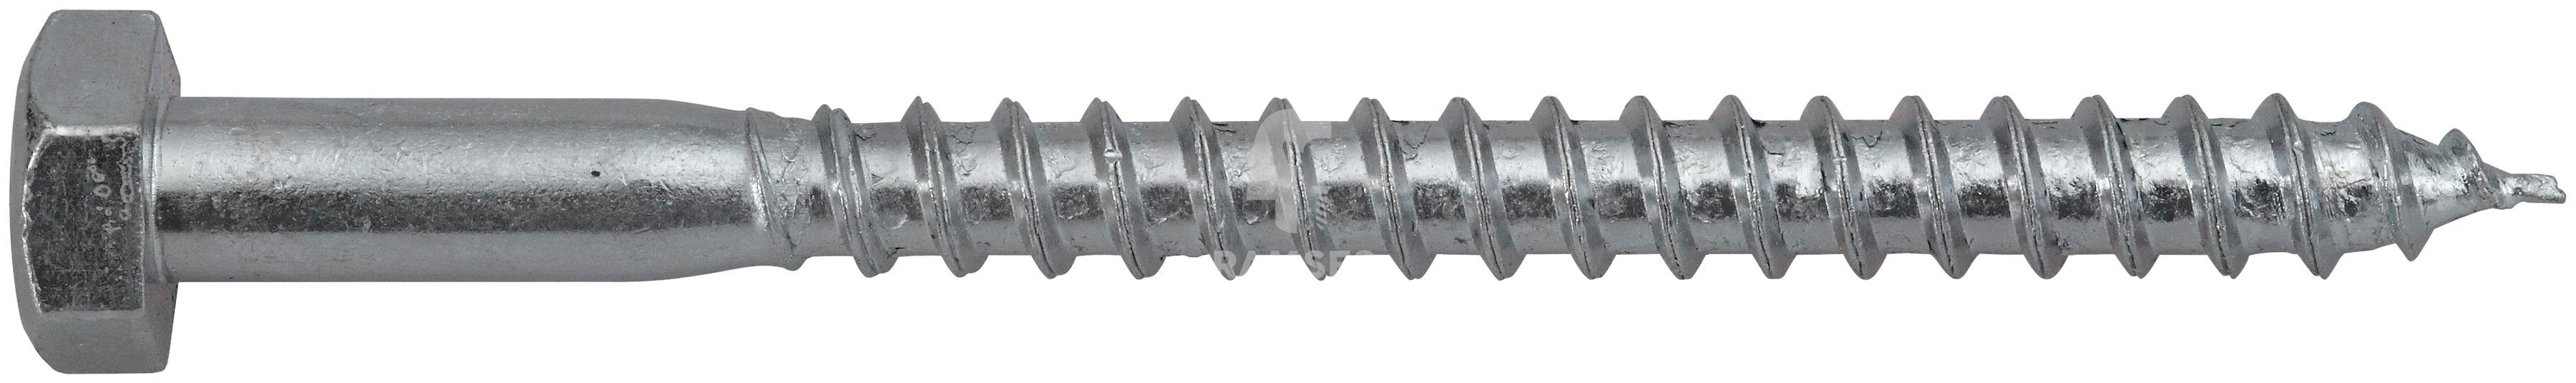 RAMSES Schrauben , Sechskant-Holzschraube 12 x 180 mm 8 Stk.